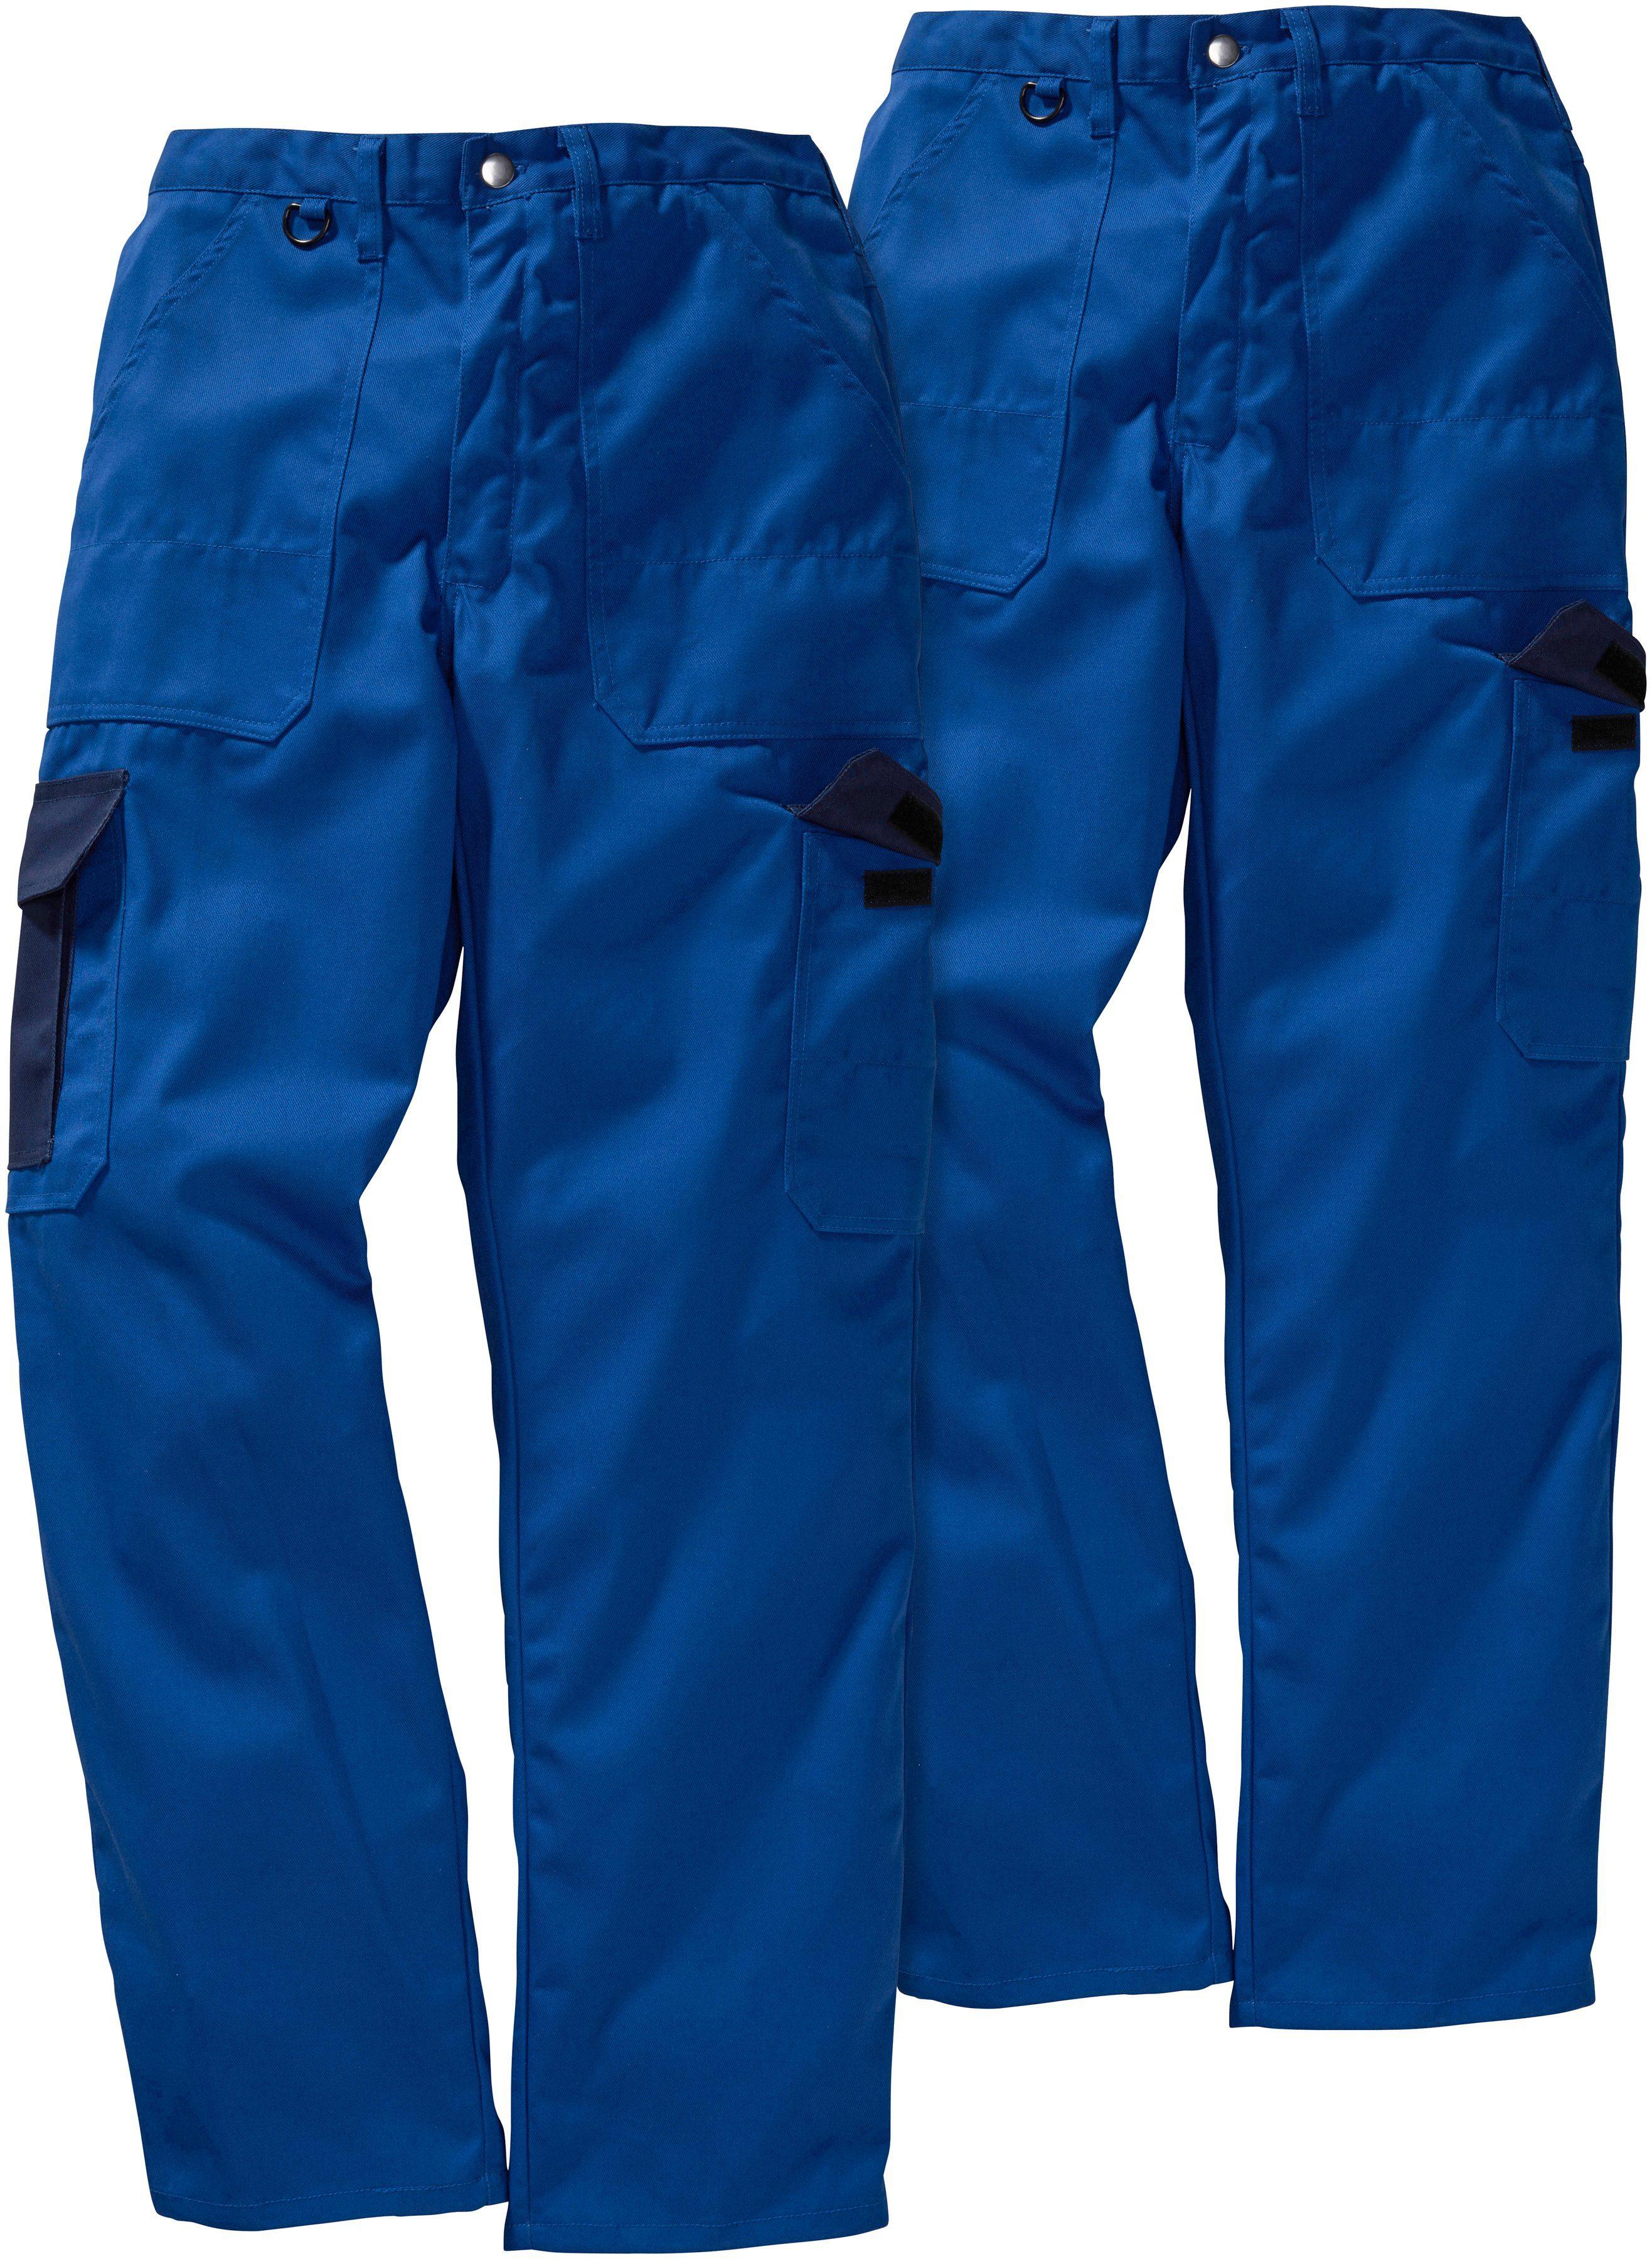 Kleidung Bundhose Classic Blau